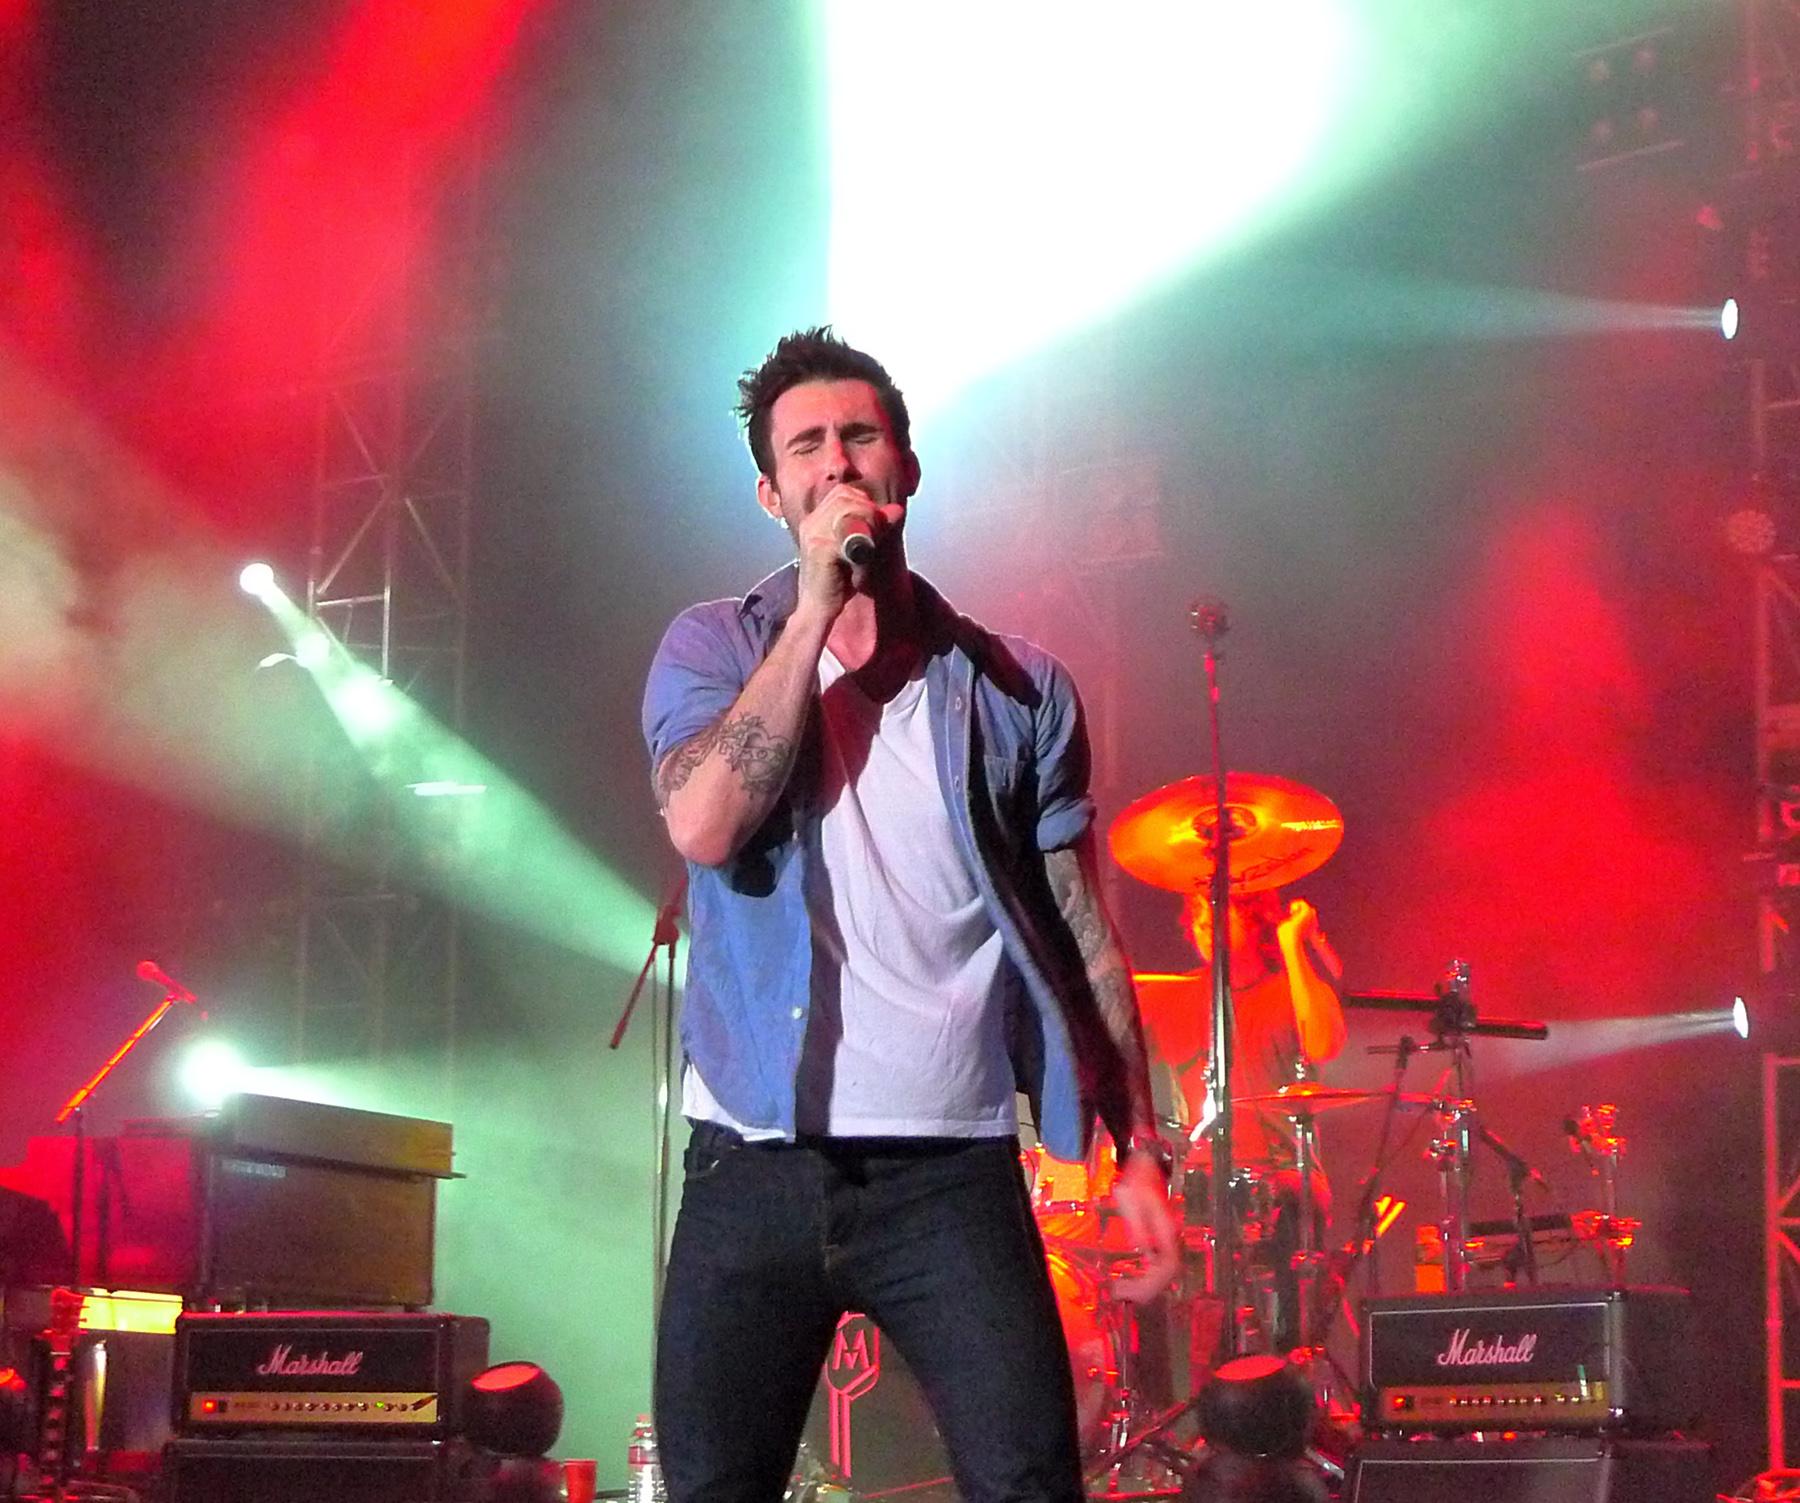 File:Maroon 5 Live in Hong Kong 29 crop.jpg - Wikimedia Commons